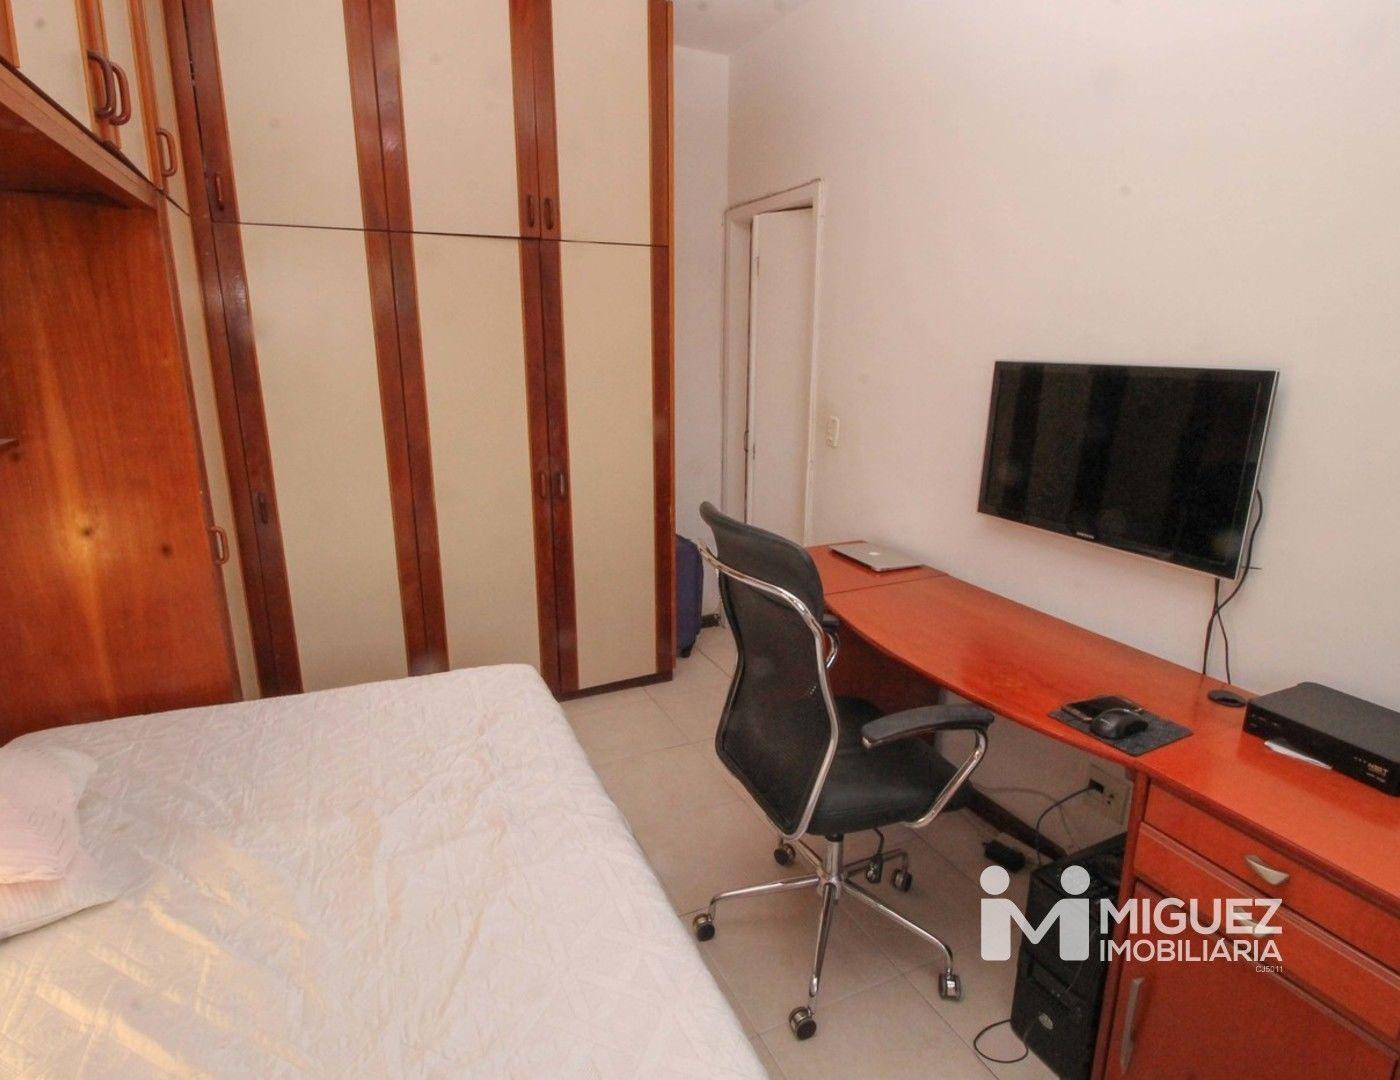 Apartamento, aluguel, Rua Garibaldi - Tijuca , Rio de janeiro